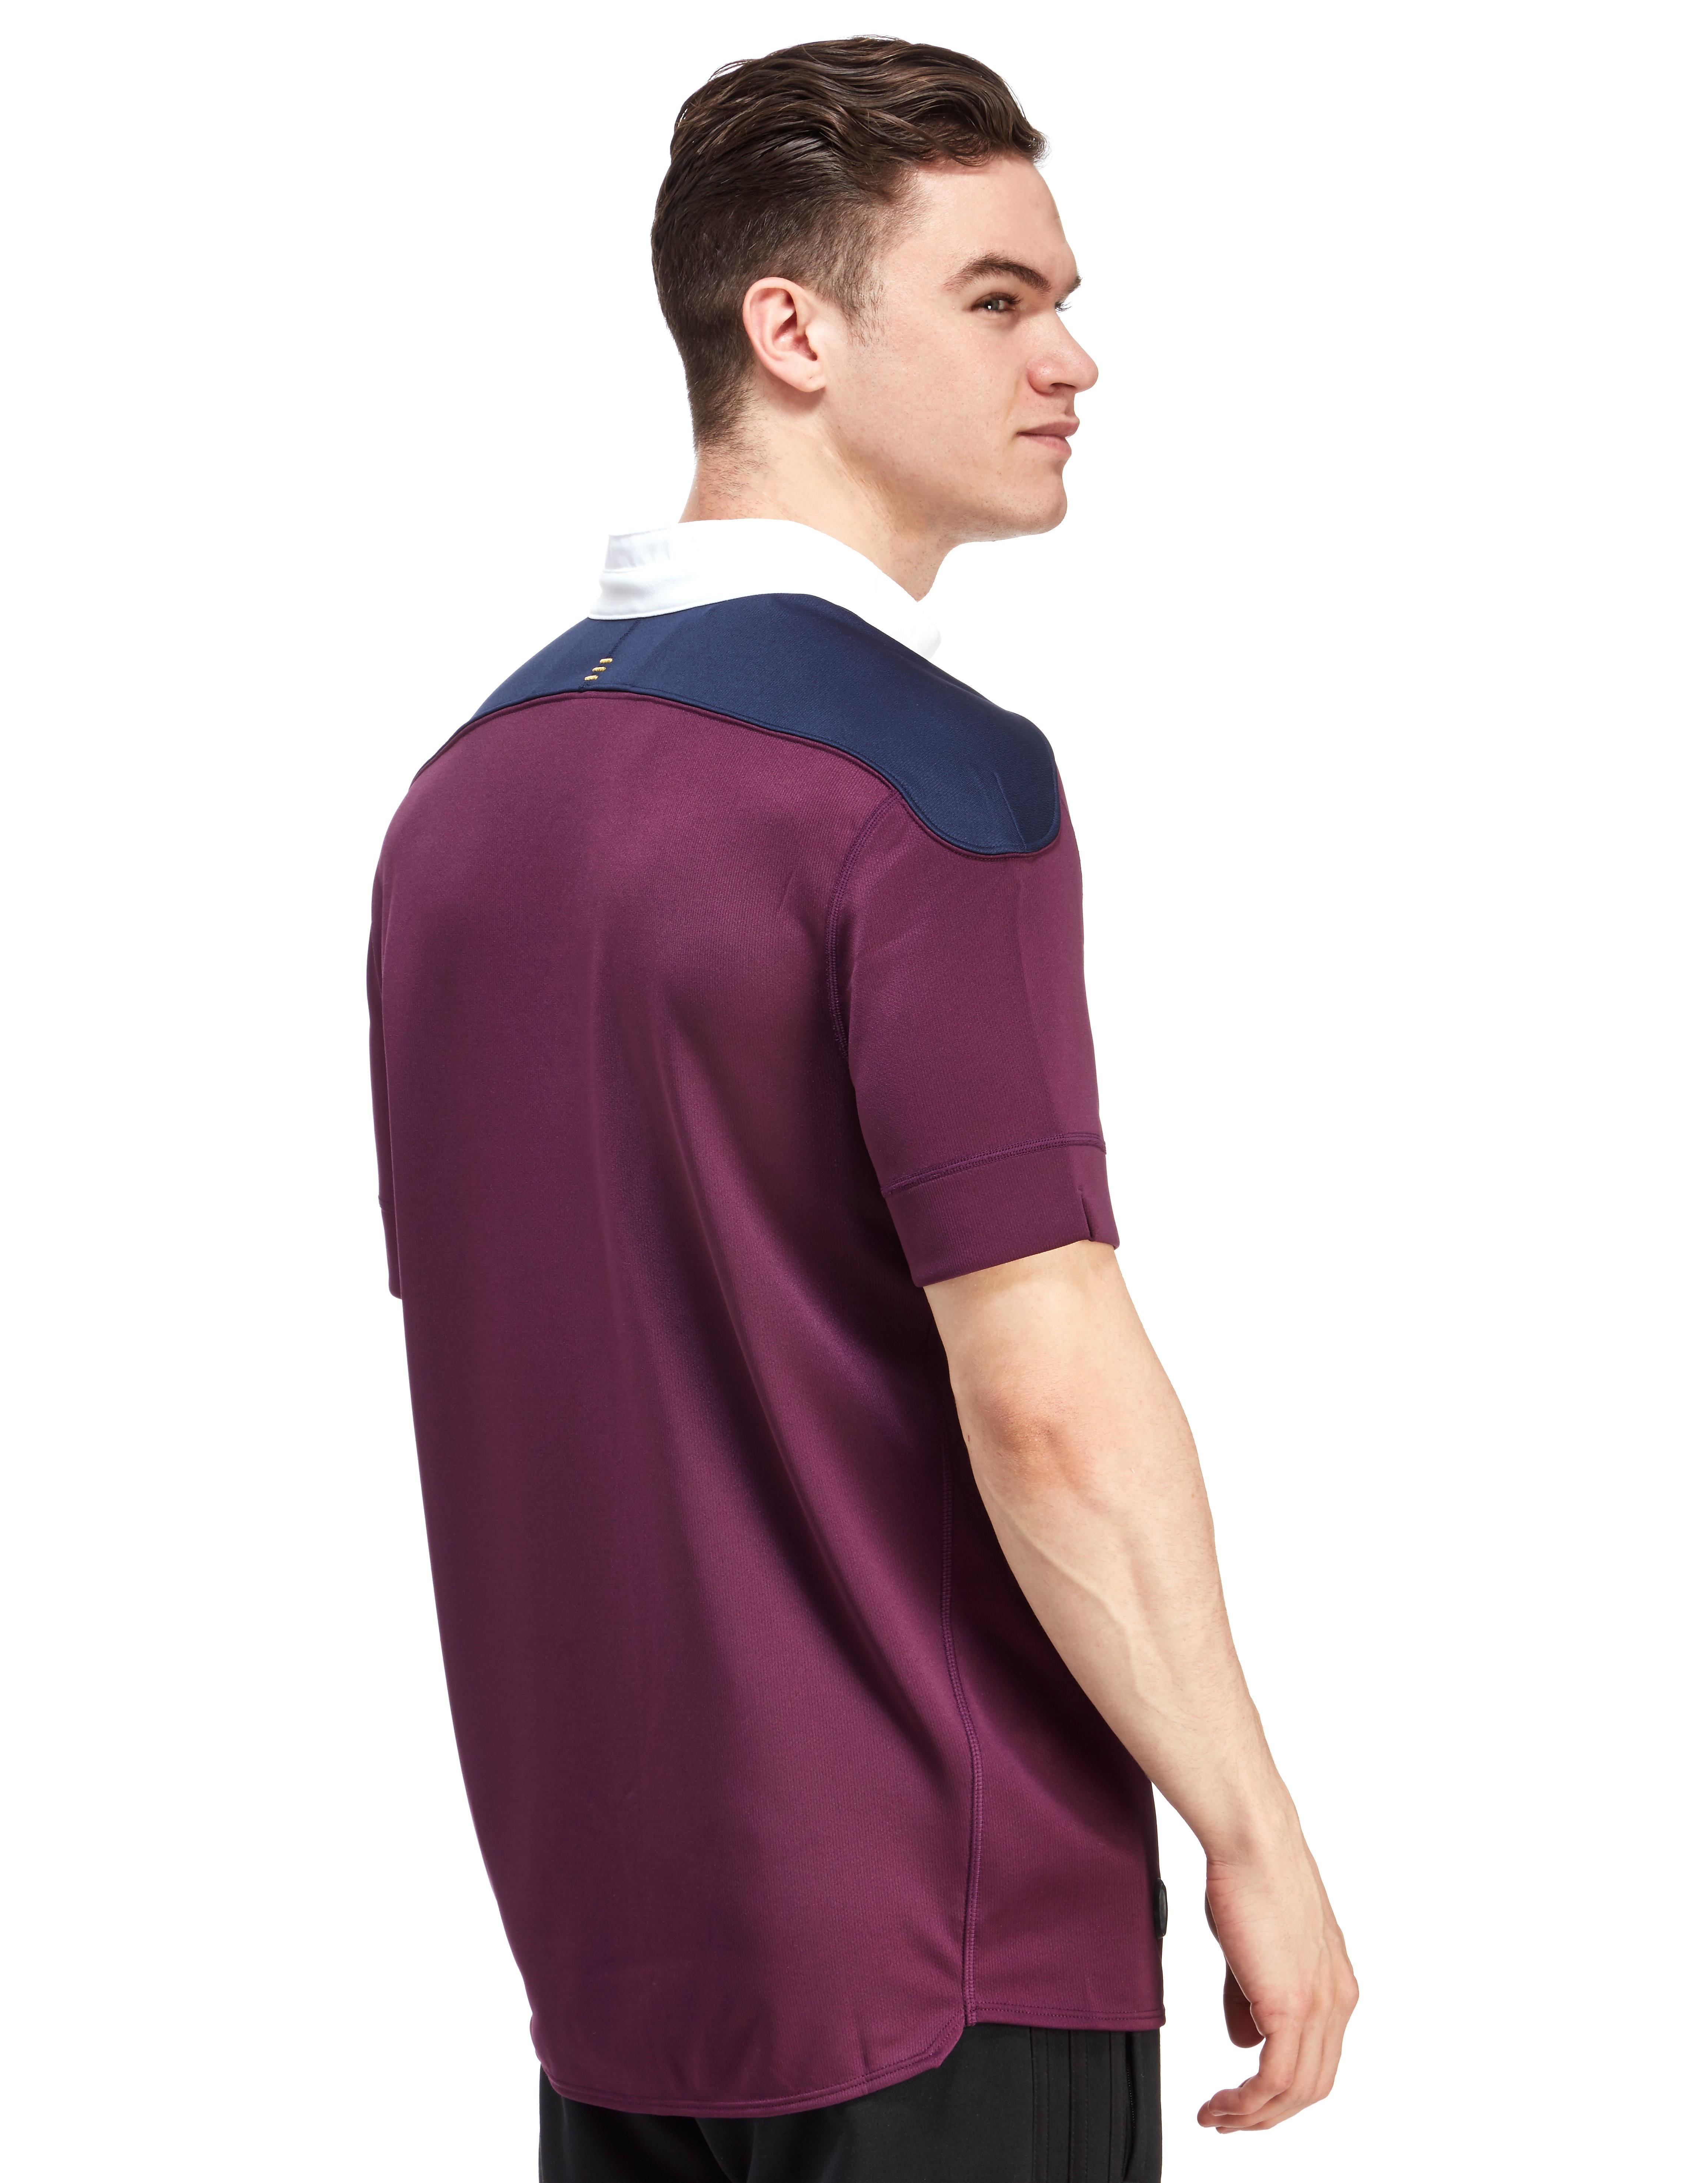 Canterbury Ireland RFU 2016/17 Alternate Shirt PRE ORDER